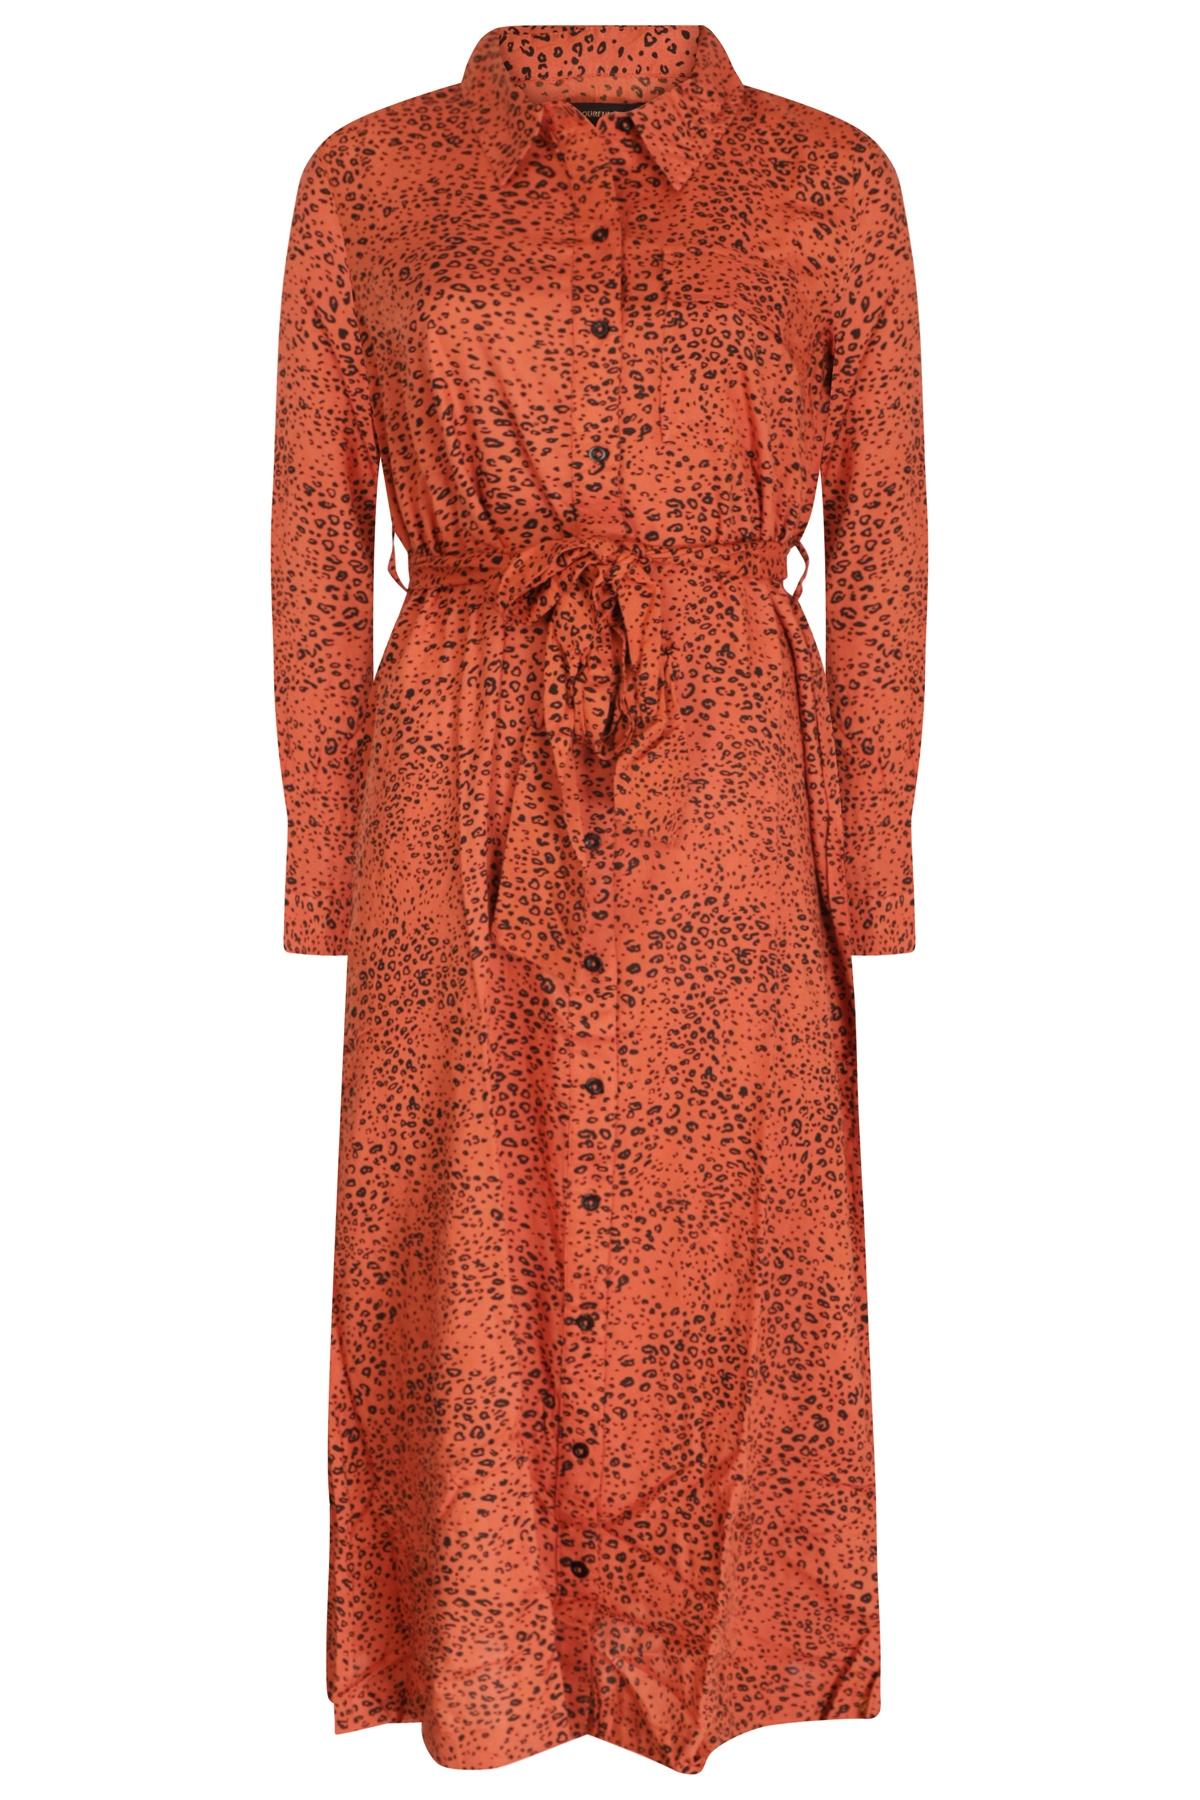 Colourful Rebel Maxi-jurken Oranje 8105